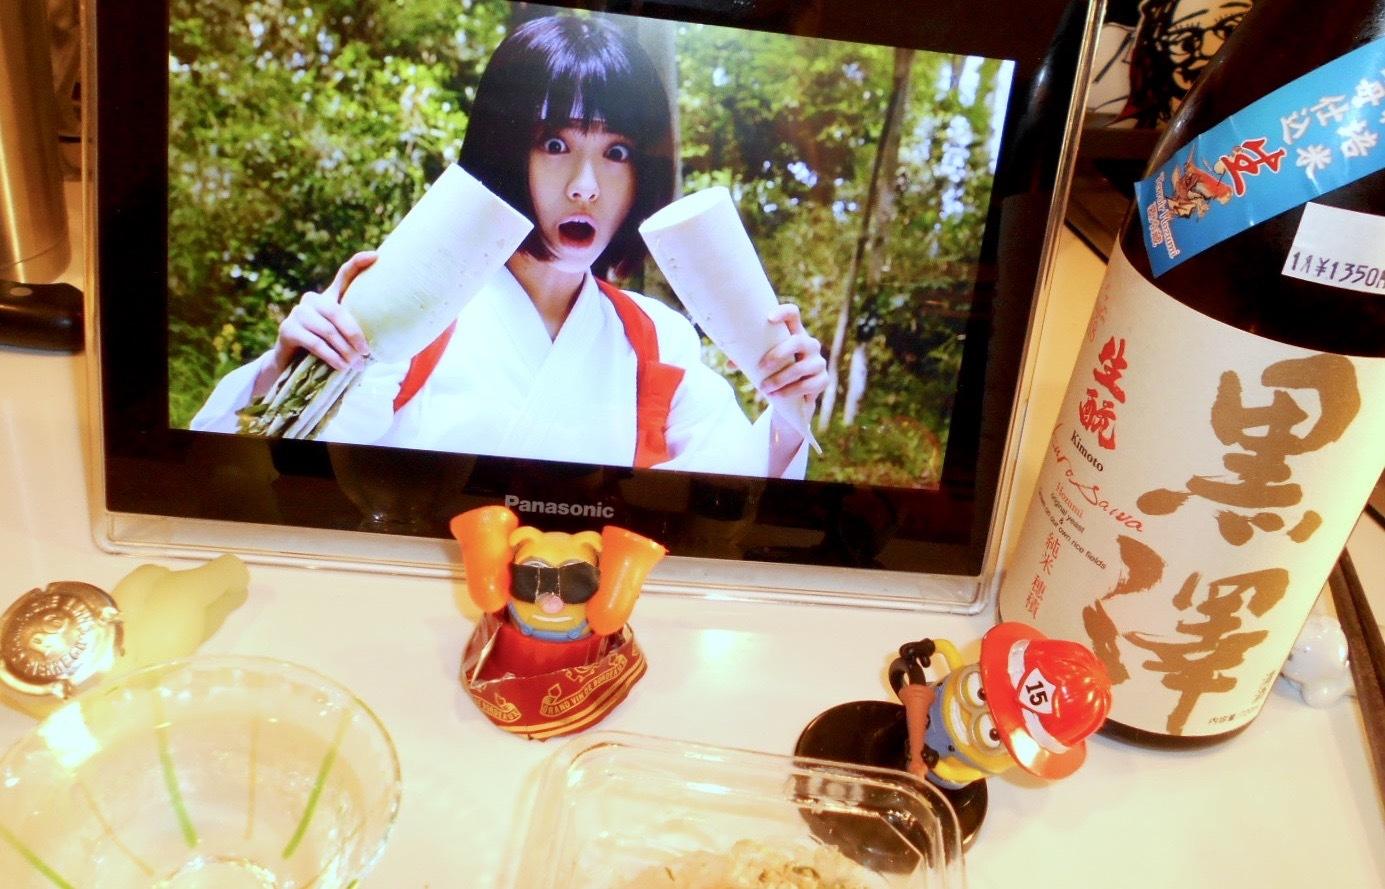 kurosawa_hozumi30by1_6.jpg